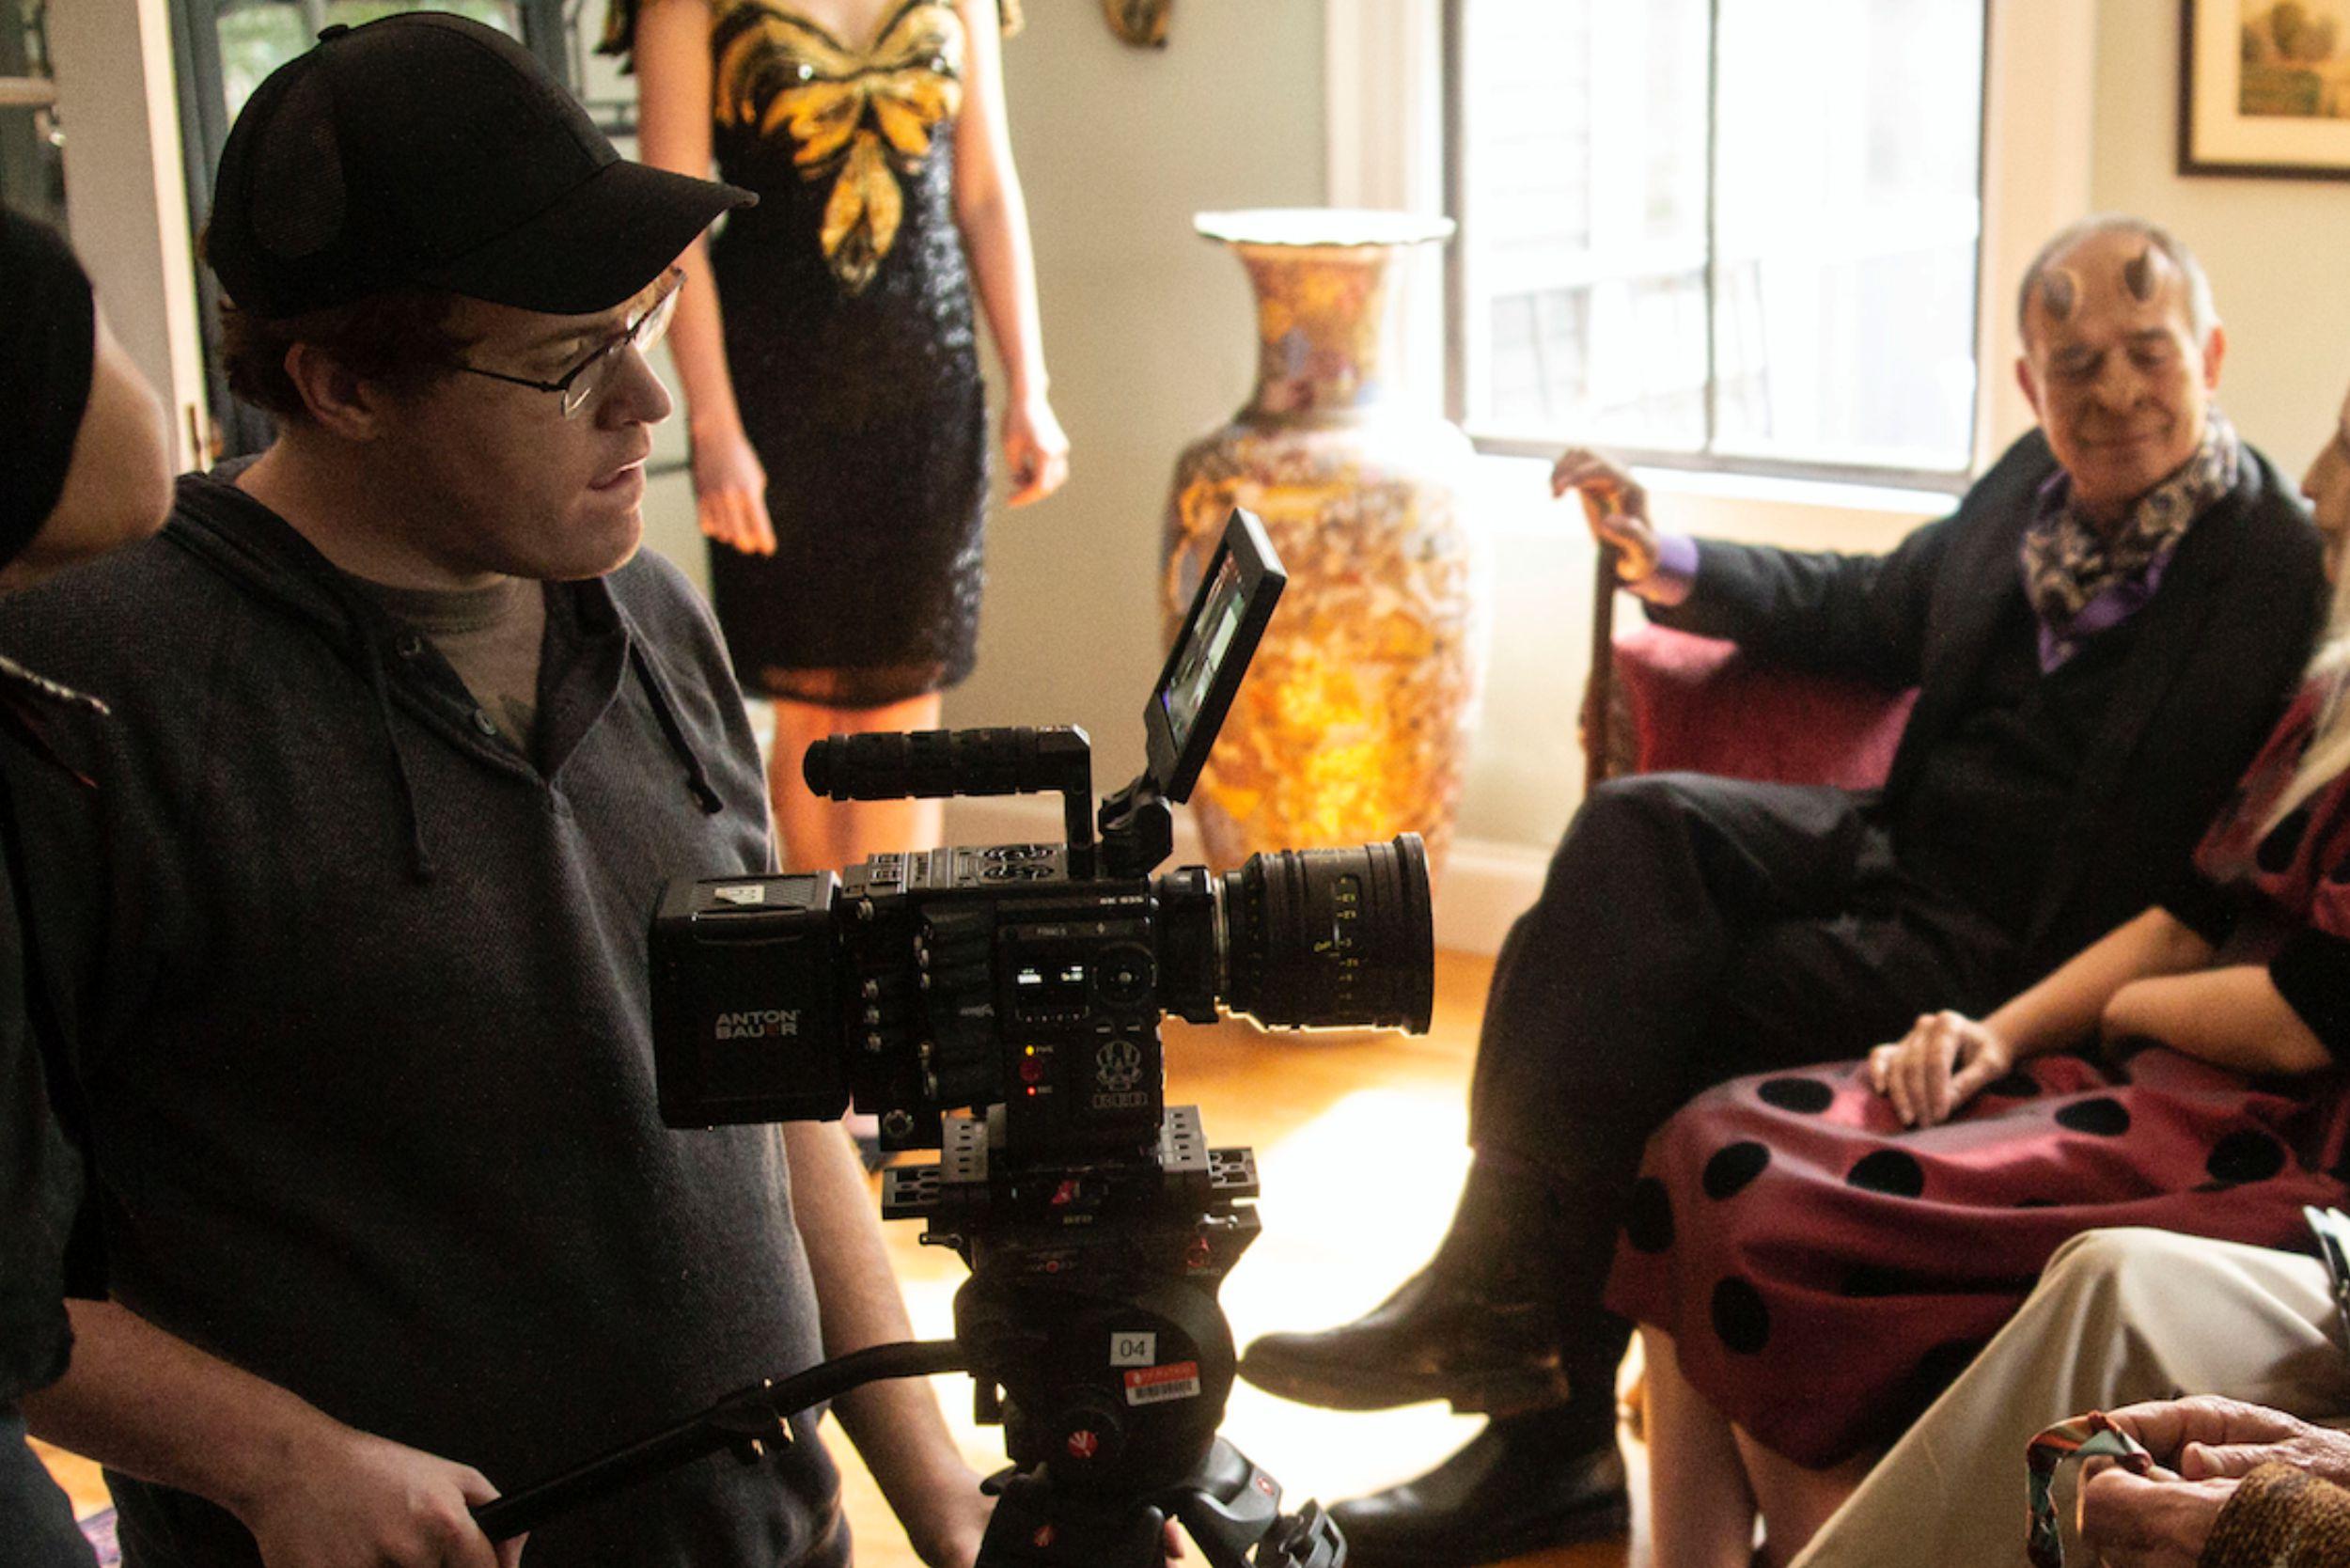 INTERVIEW WITH DIRECTOR BEN TOBIN